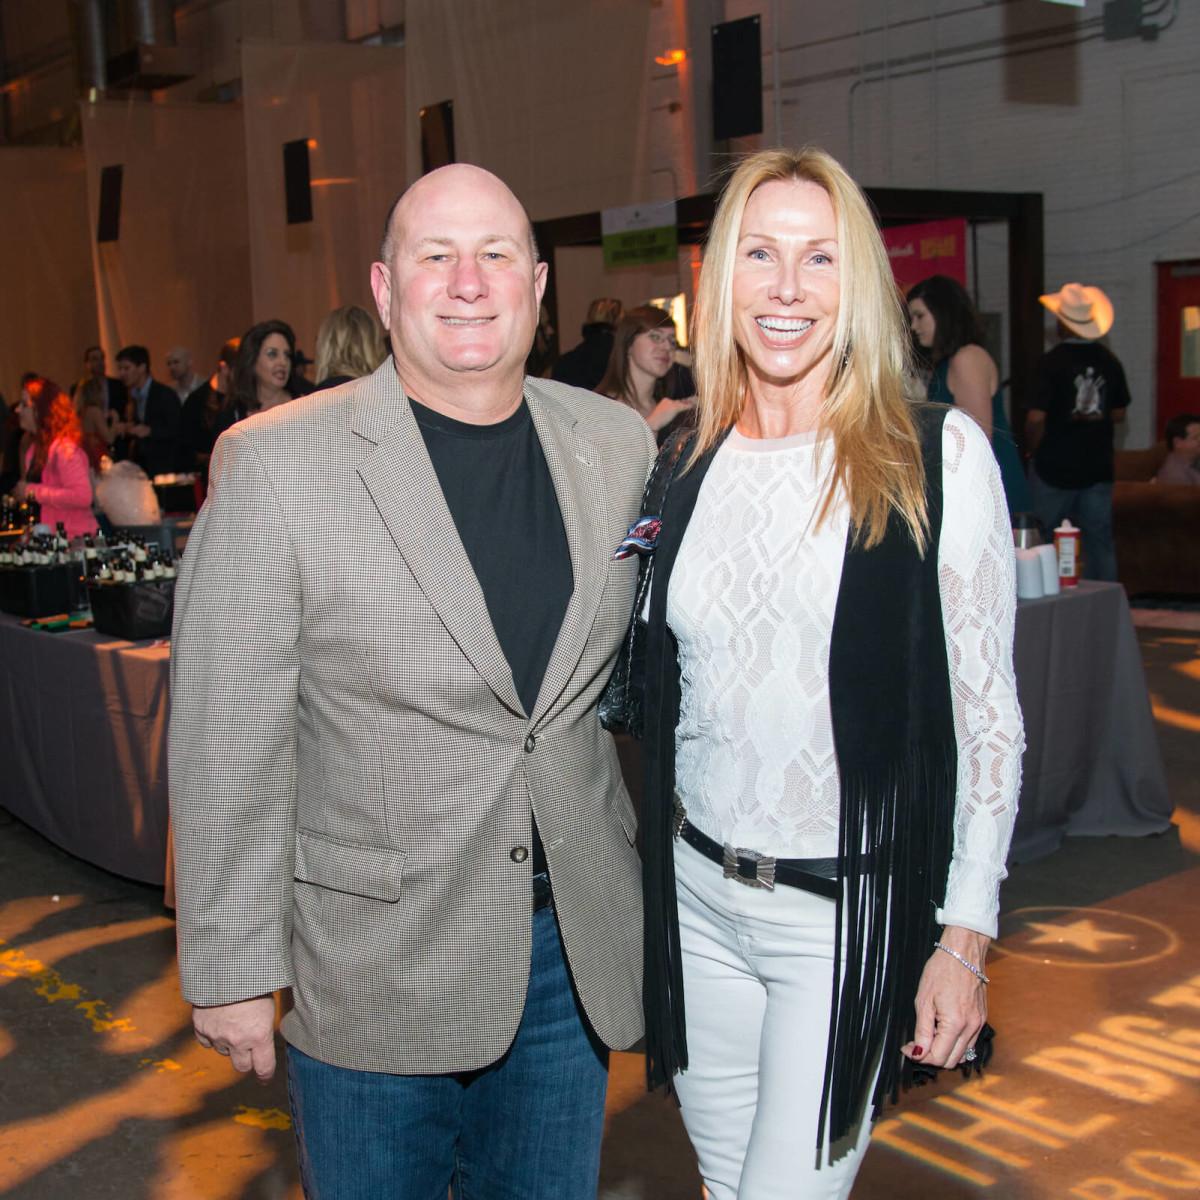 Paul Dabrowski, Mellissa Dabrowski at Big Texas Party